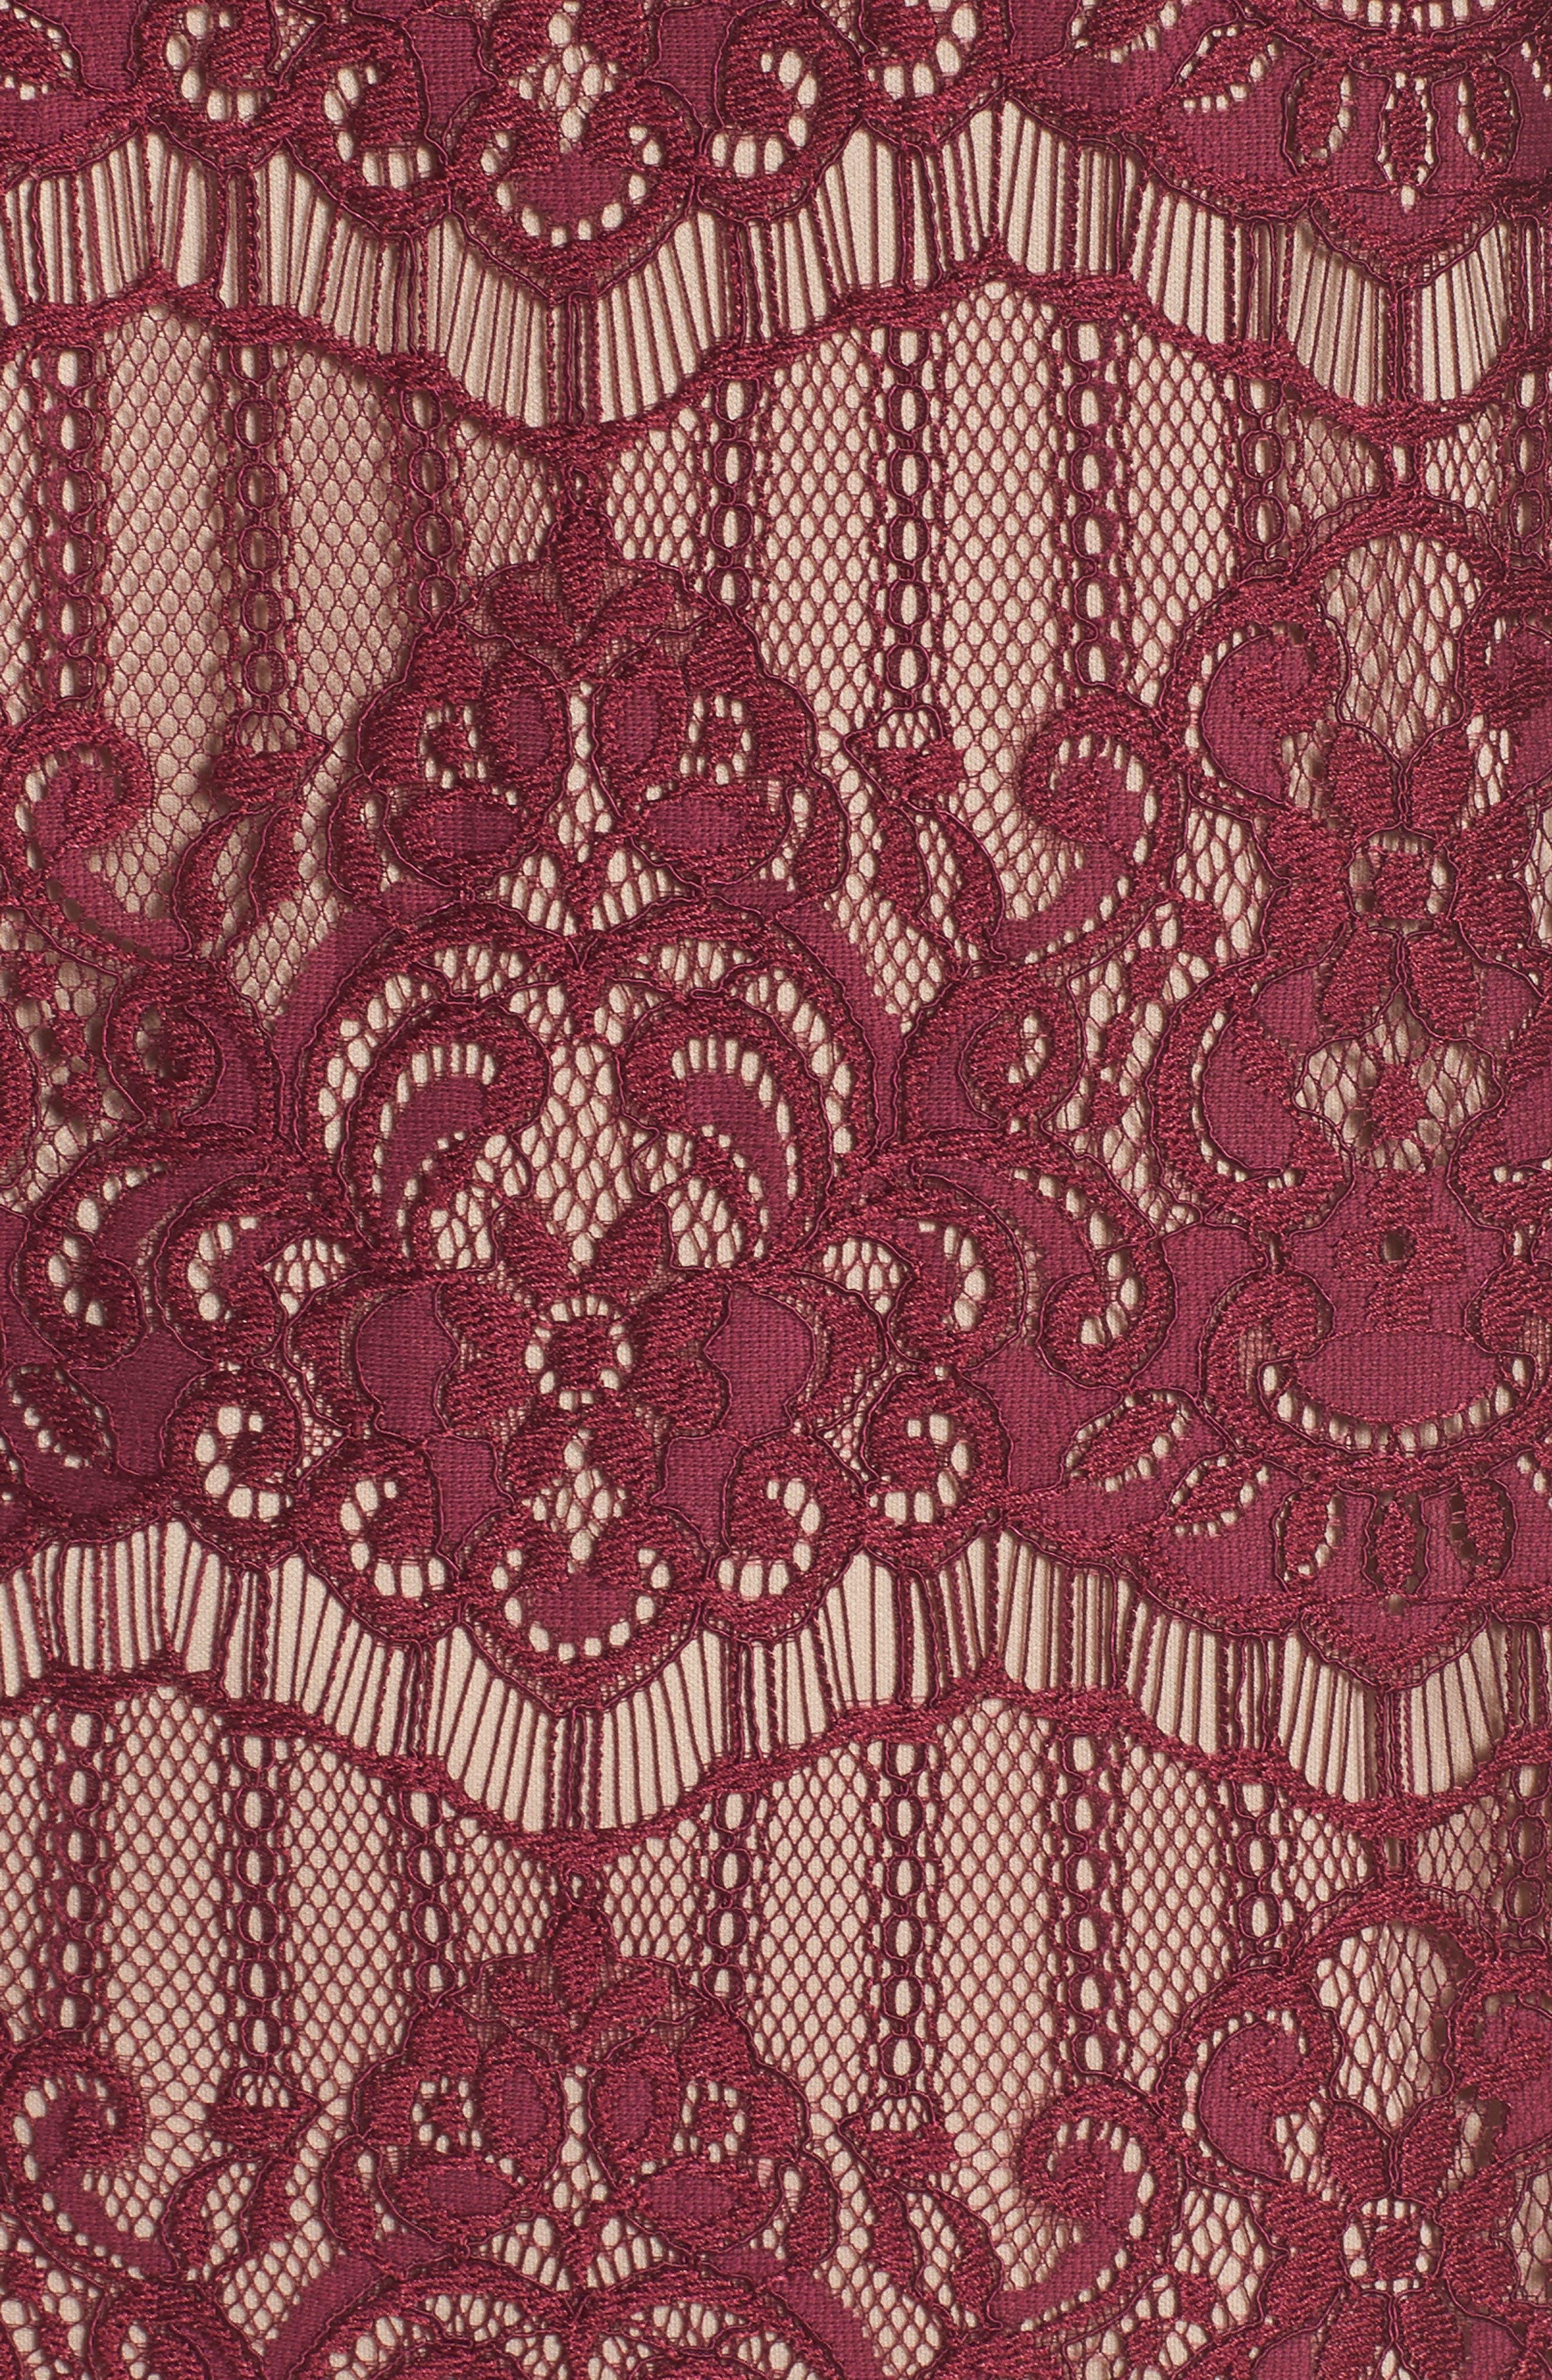 Scalloped Lace Sheath Dress,                             Alternate thumbnail 5, color,                             640